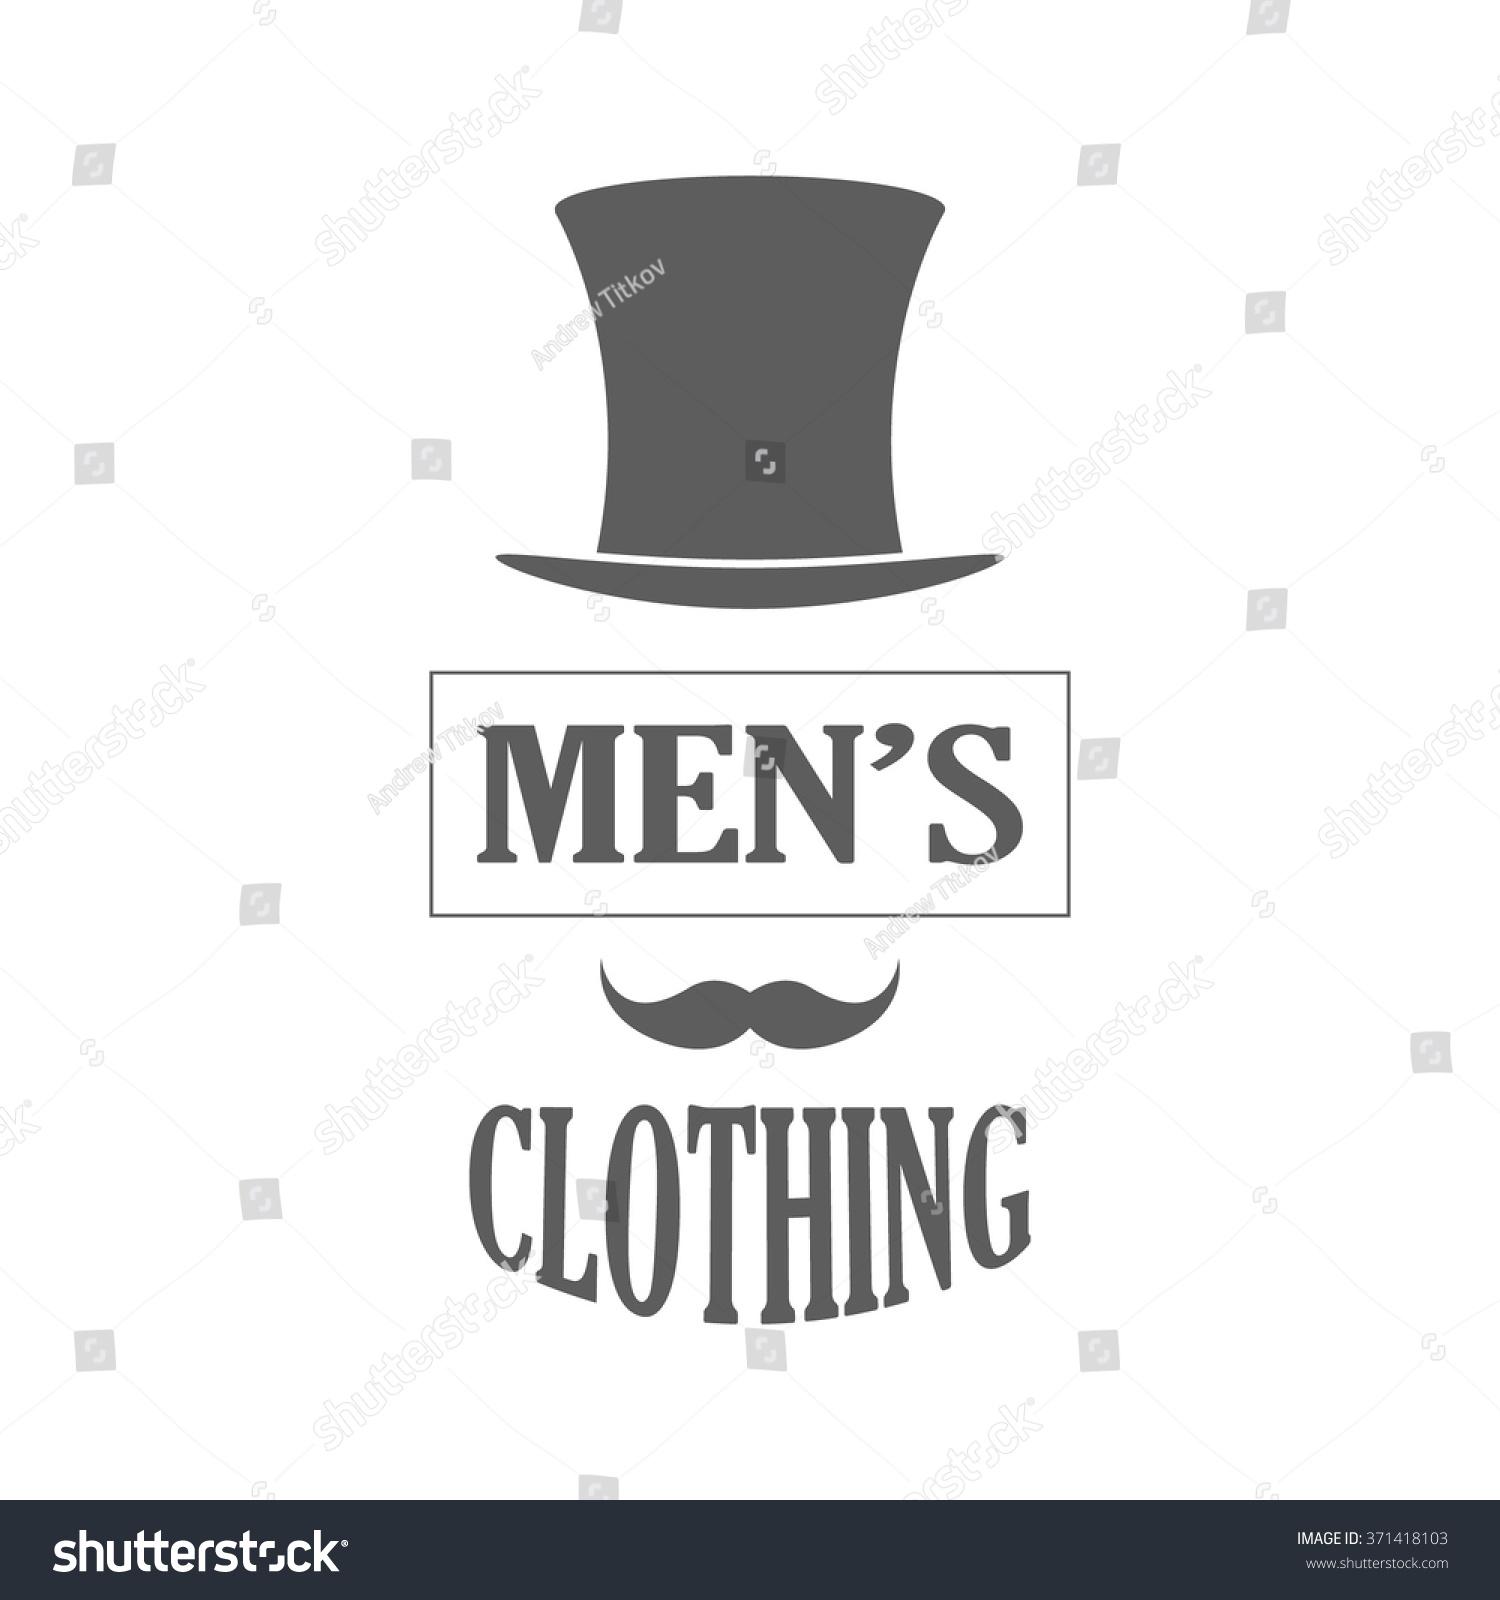 Clothing Store Logo Retro Style Mens Stock-Vektorgrafik 371418103 ...